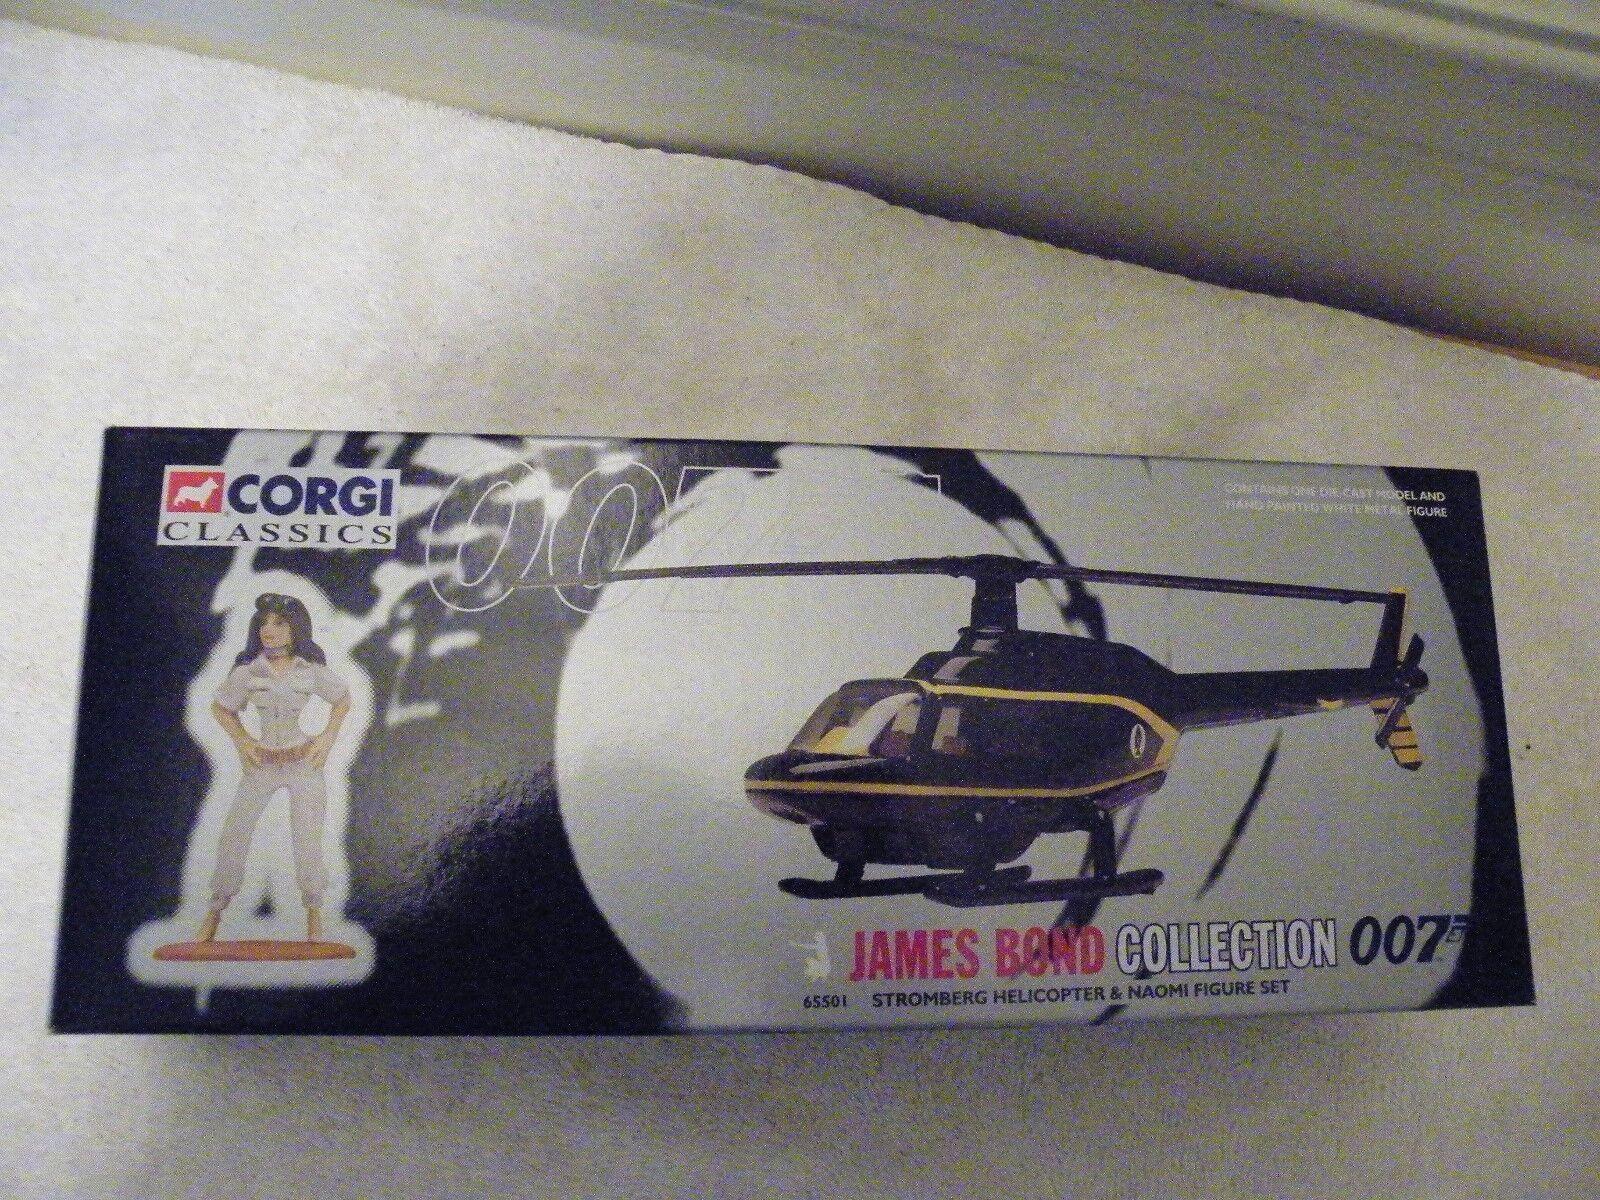 Bond Corgi classics classics classics helicopter w figure-MIB 9cfcc7